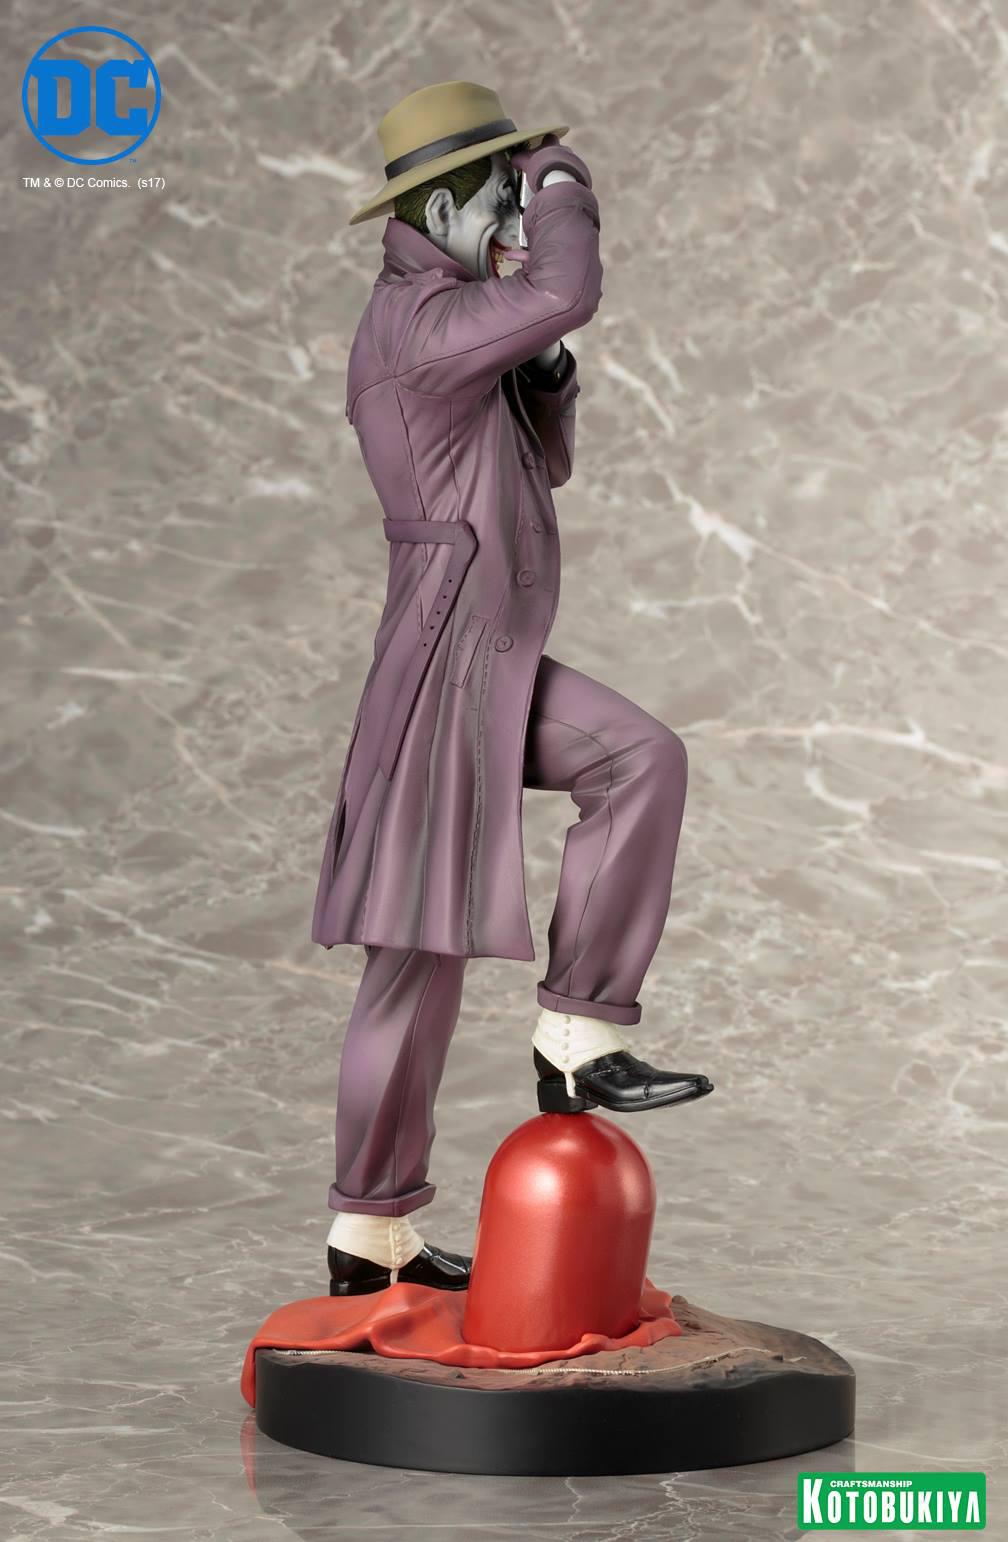 kotobukiya-joker-the-killing-joke-statue-5